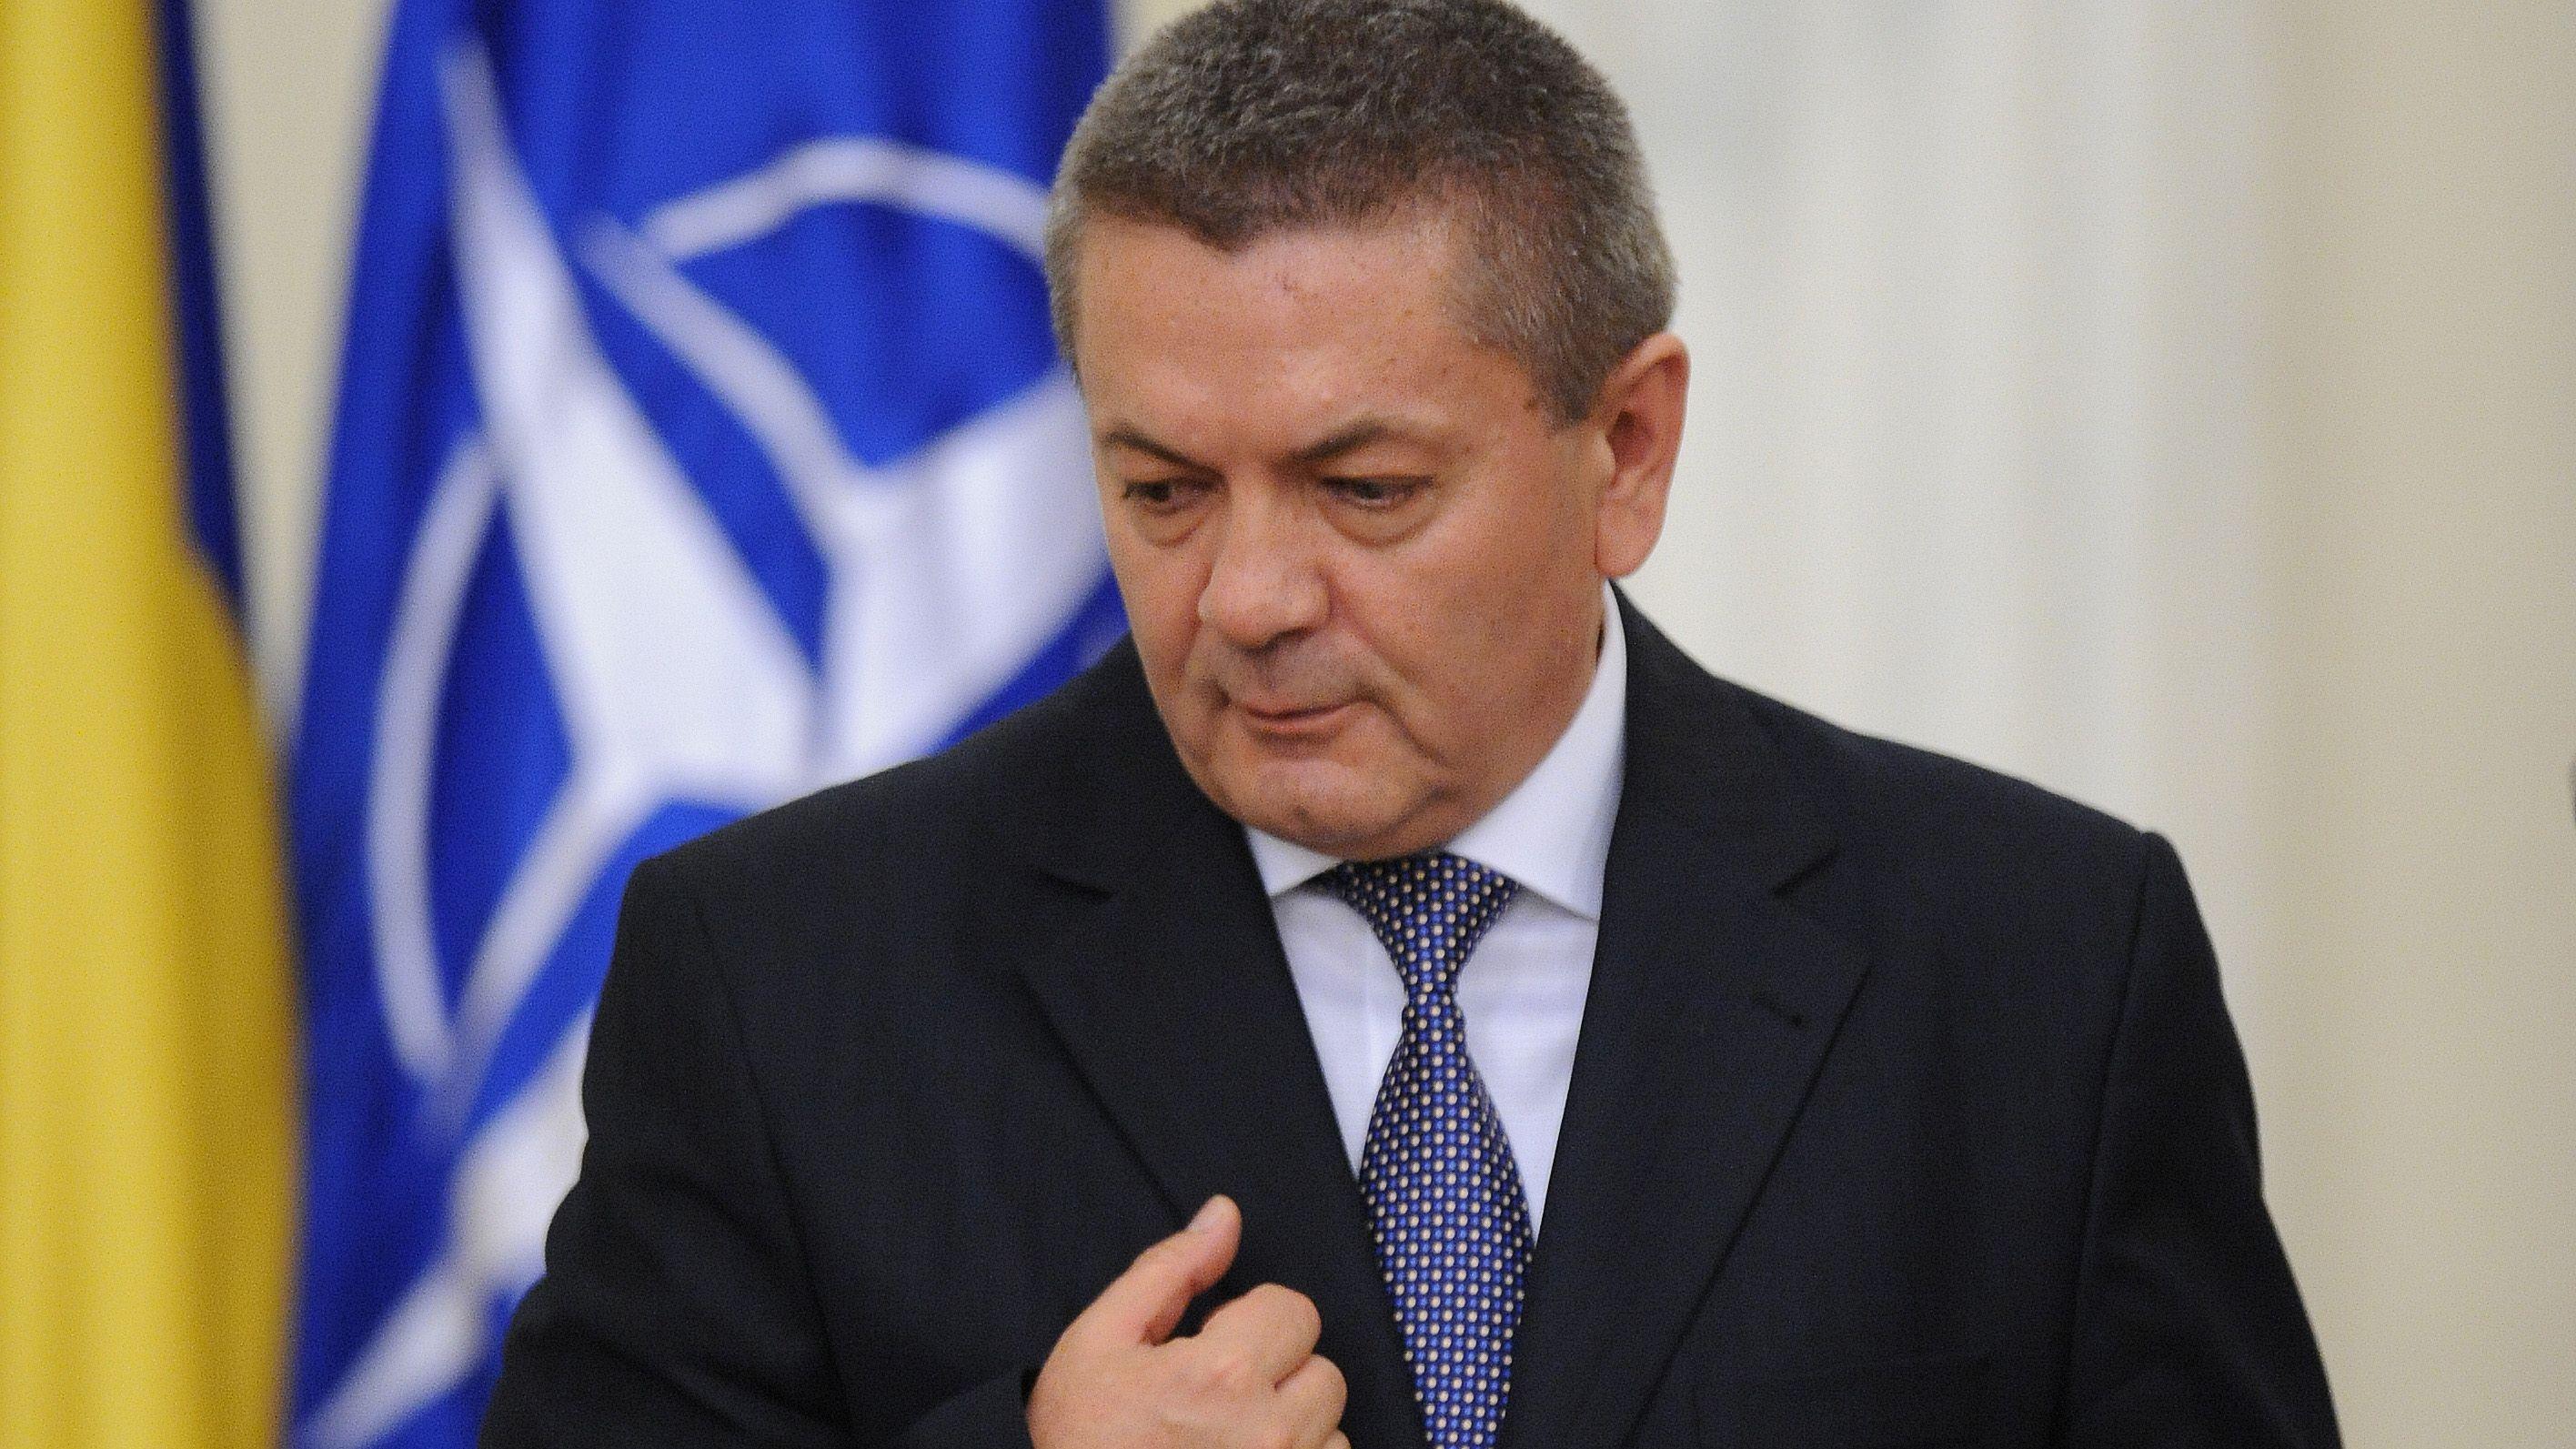 Romanian Transport minister resigns after shocking statements on Diaspora